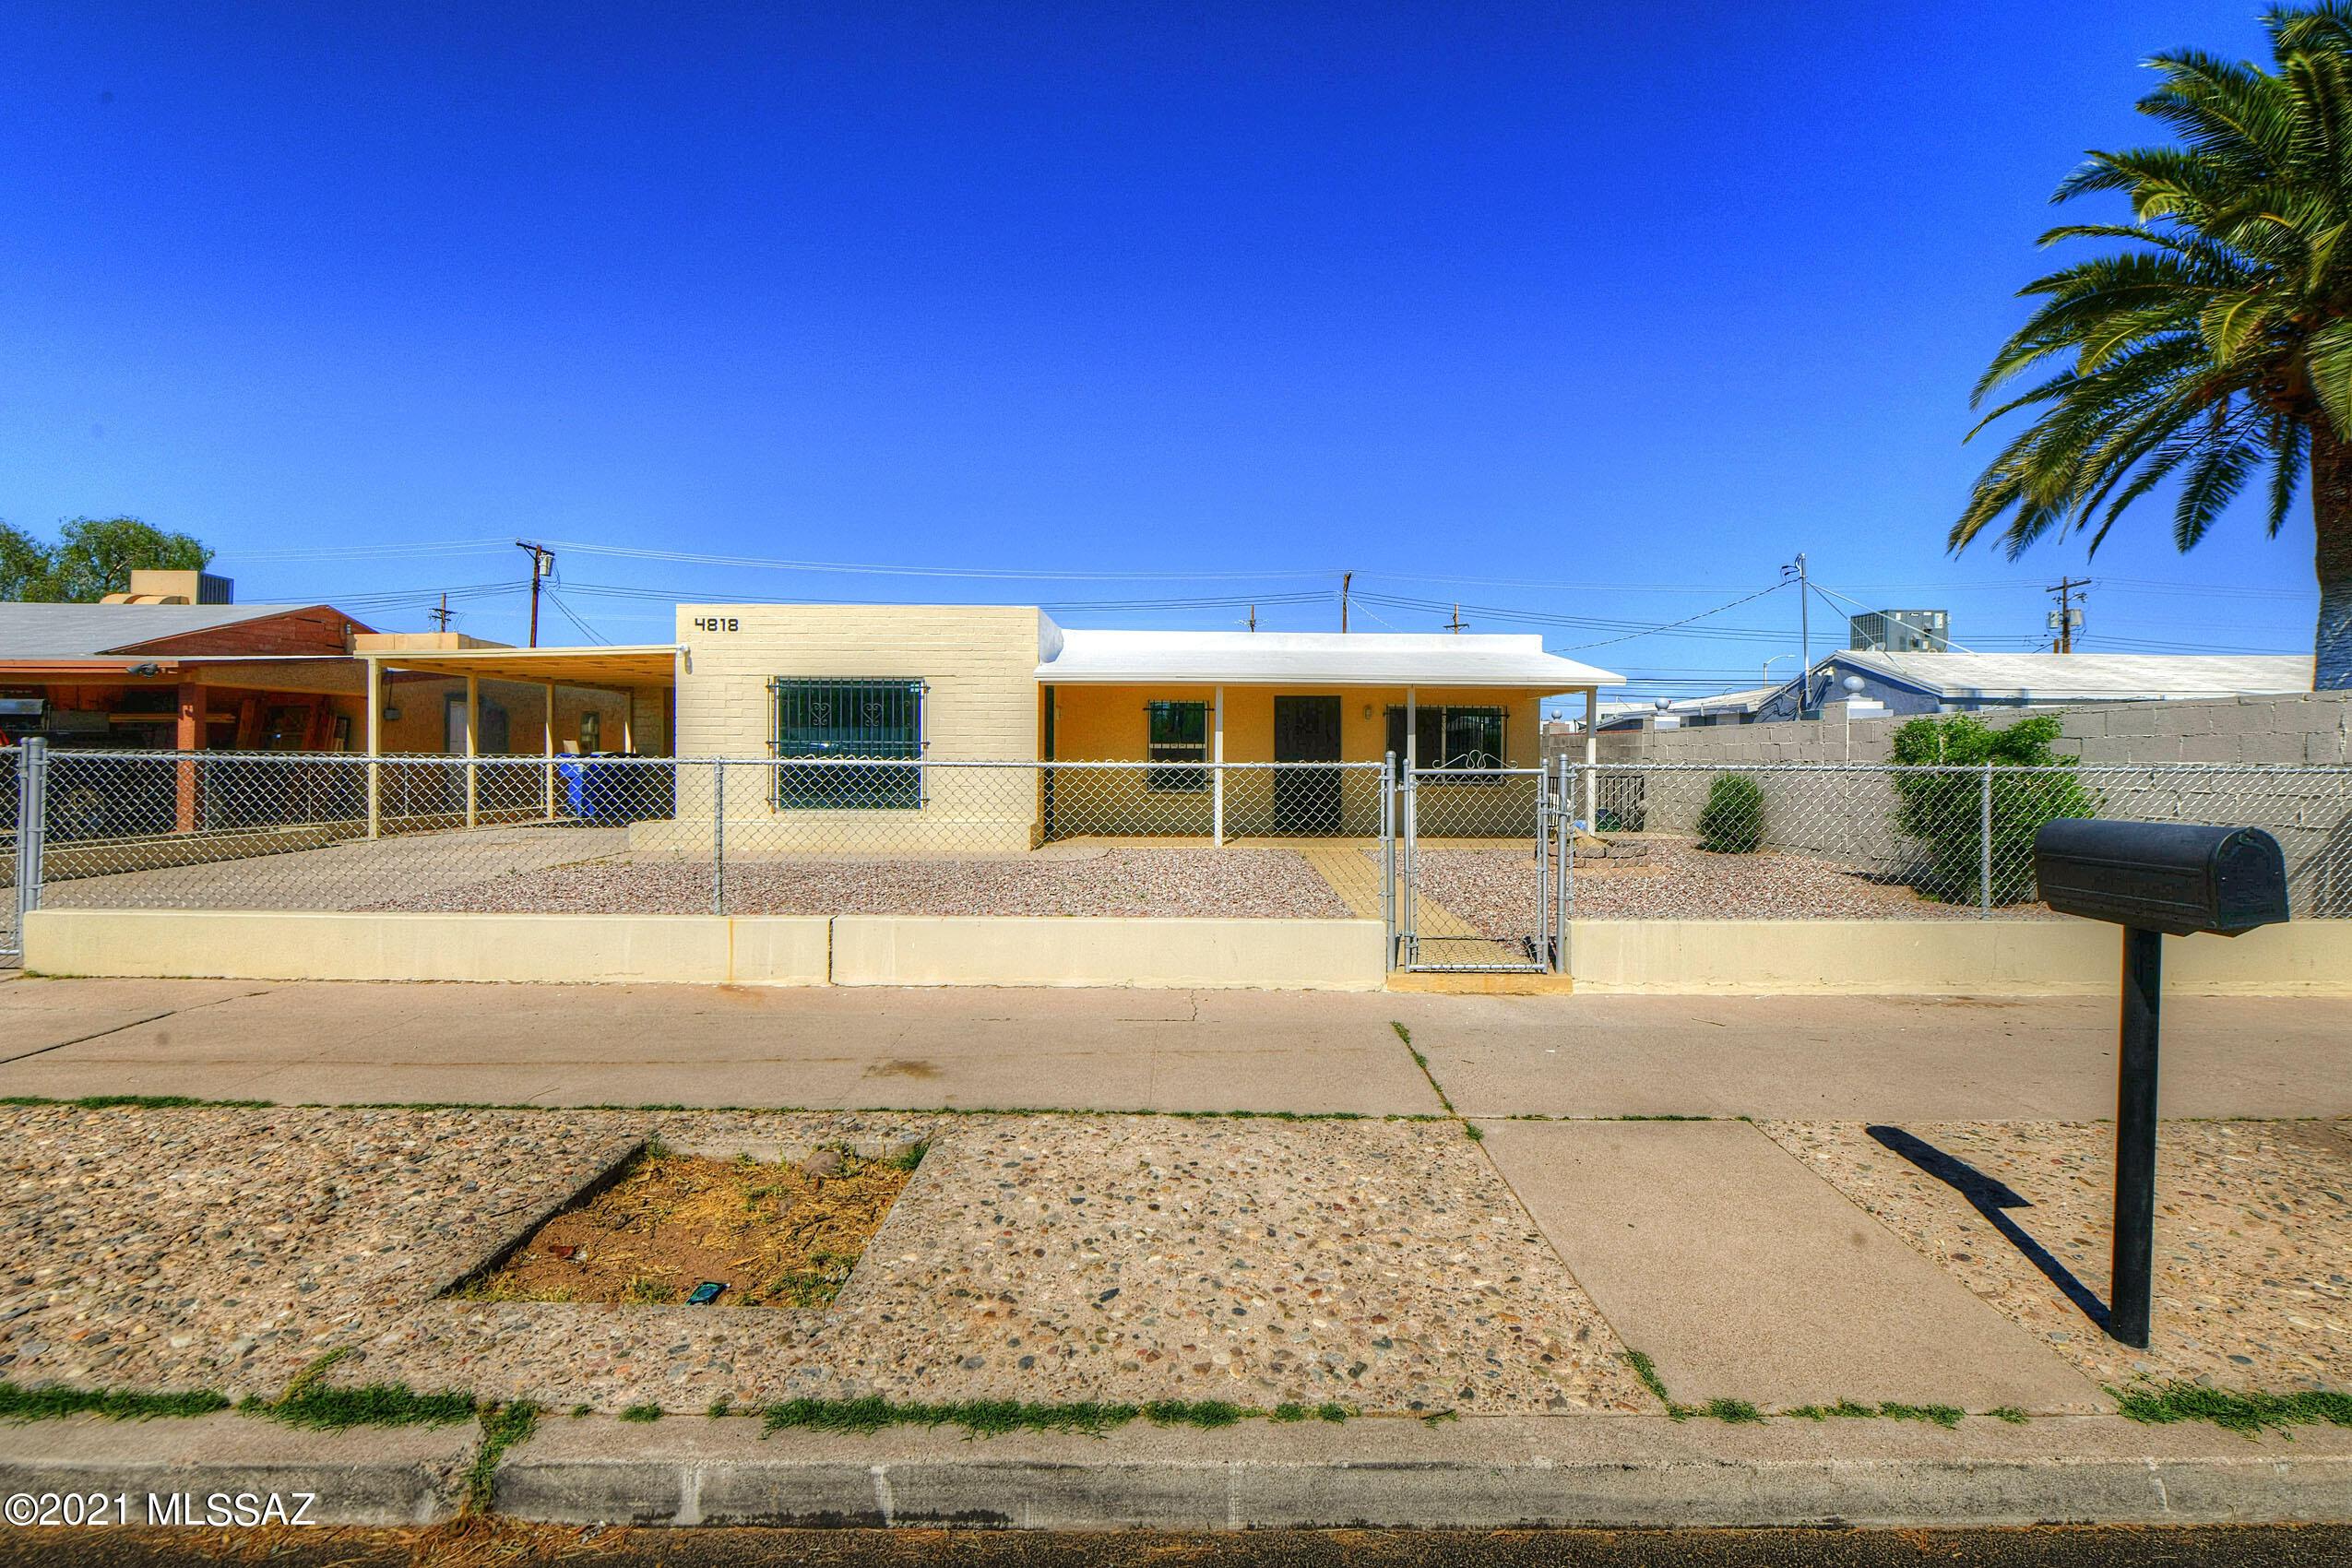 4818 S 11Th Avenue, Tucson, Arizona 85714, 4 Bedrooms Bedrooms, ,2 BathroomsBathrooms,Single Family,For Sale,4818 S 11Th Avenue,22111379